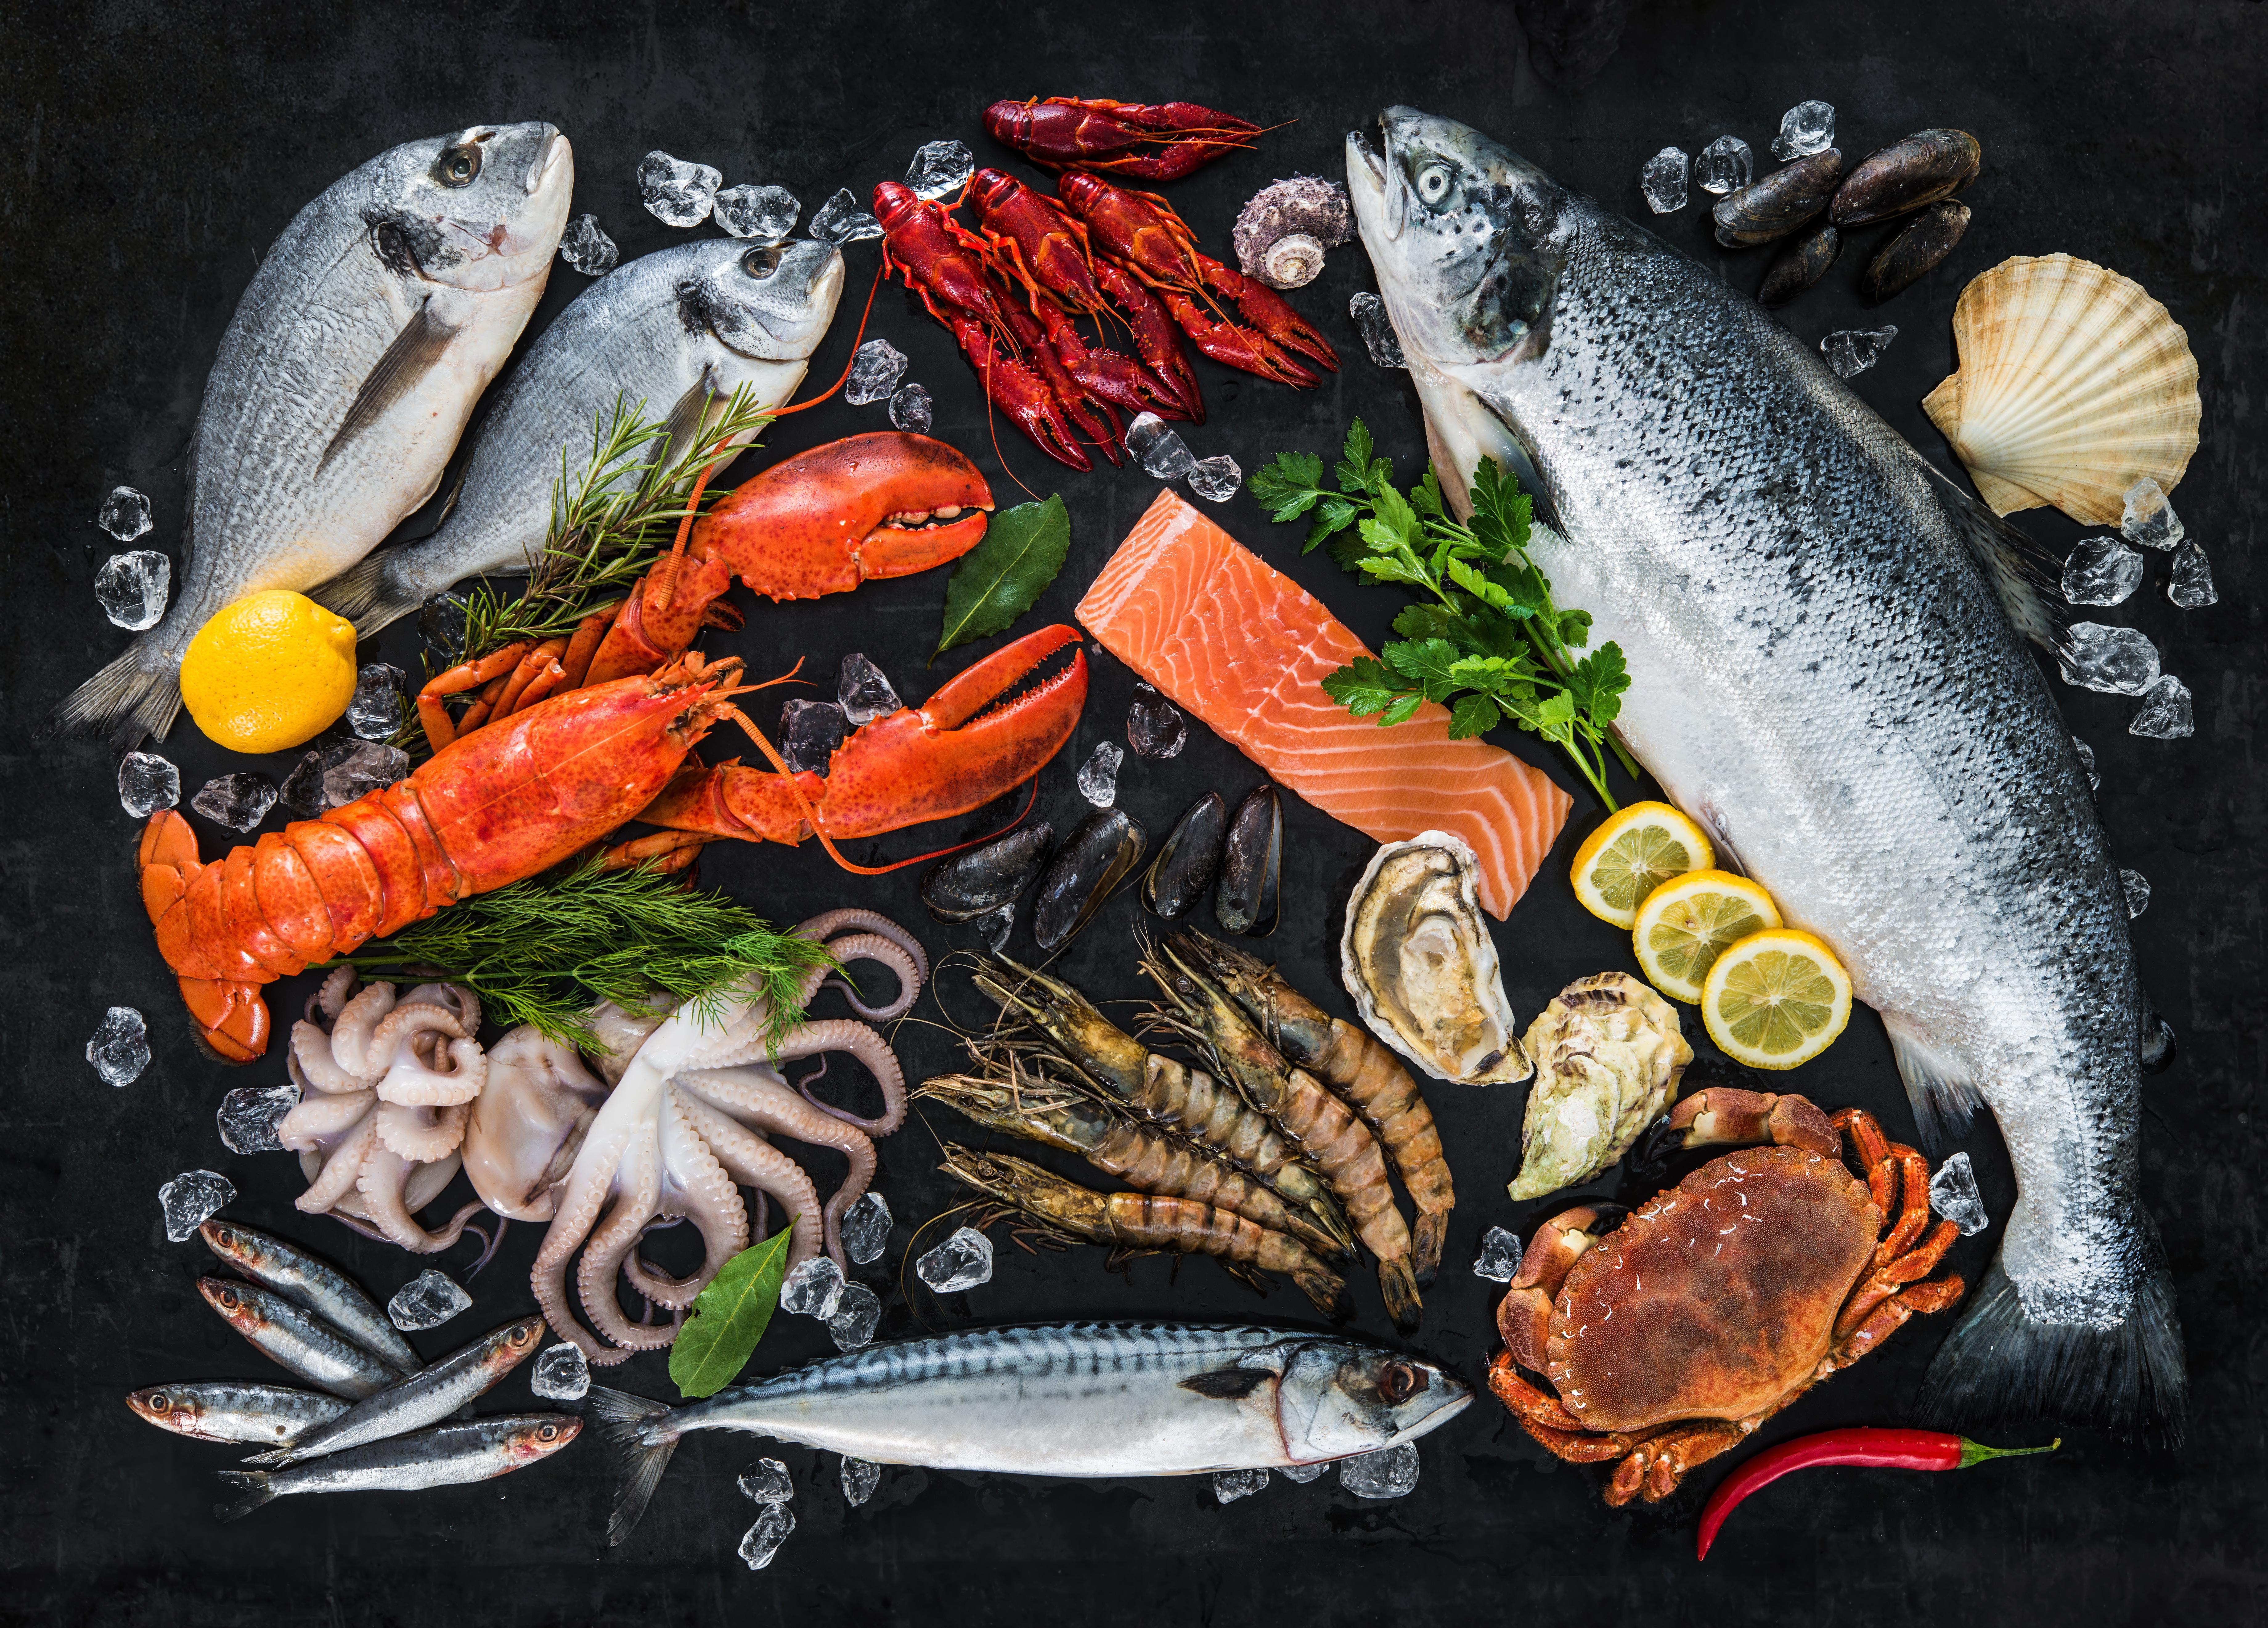 Frozen seafood delivery Selangor, Klang, Ipoh, Penang, Malaysia